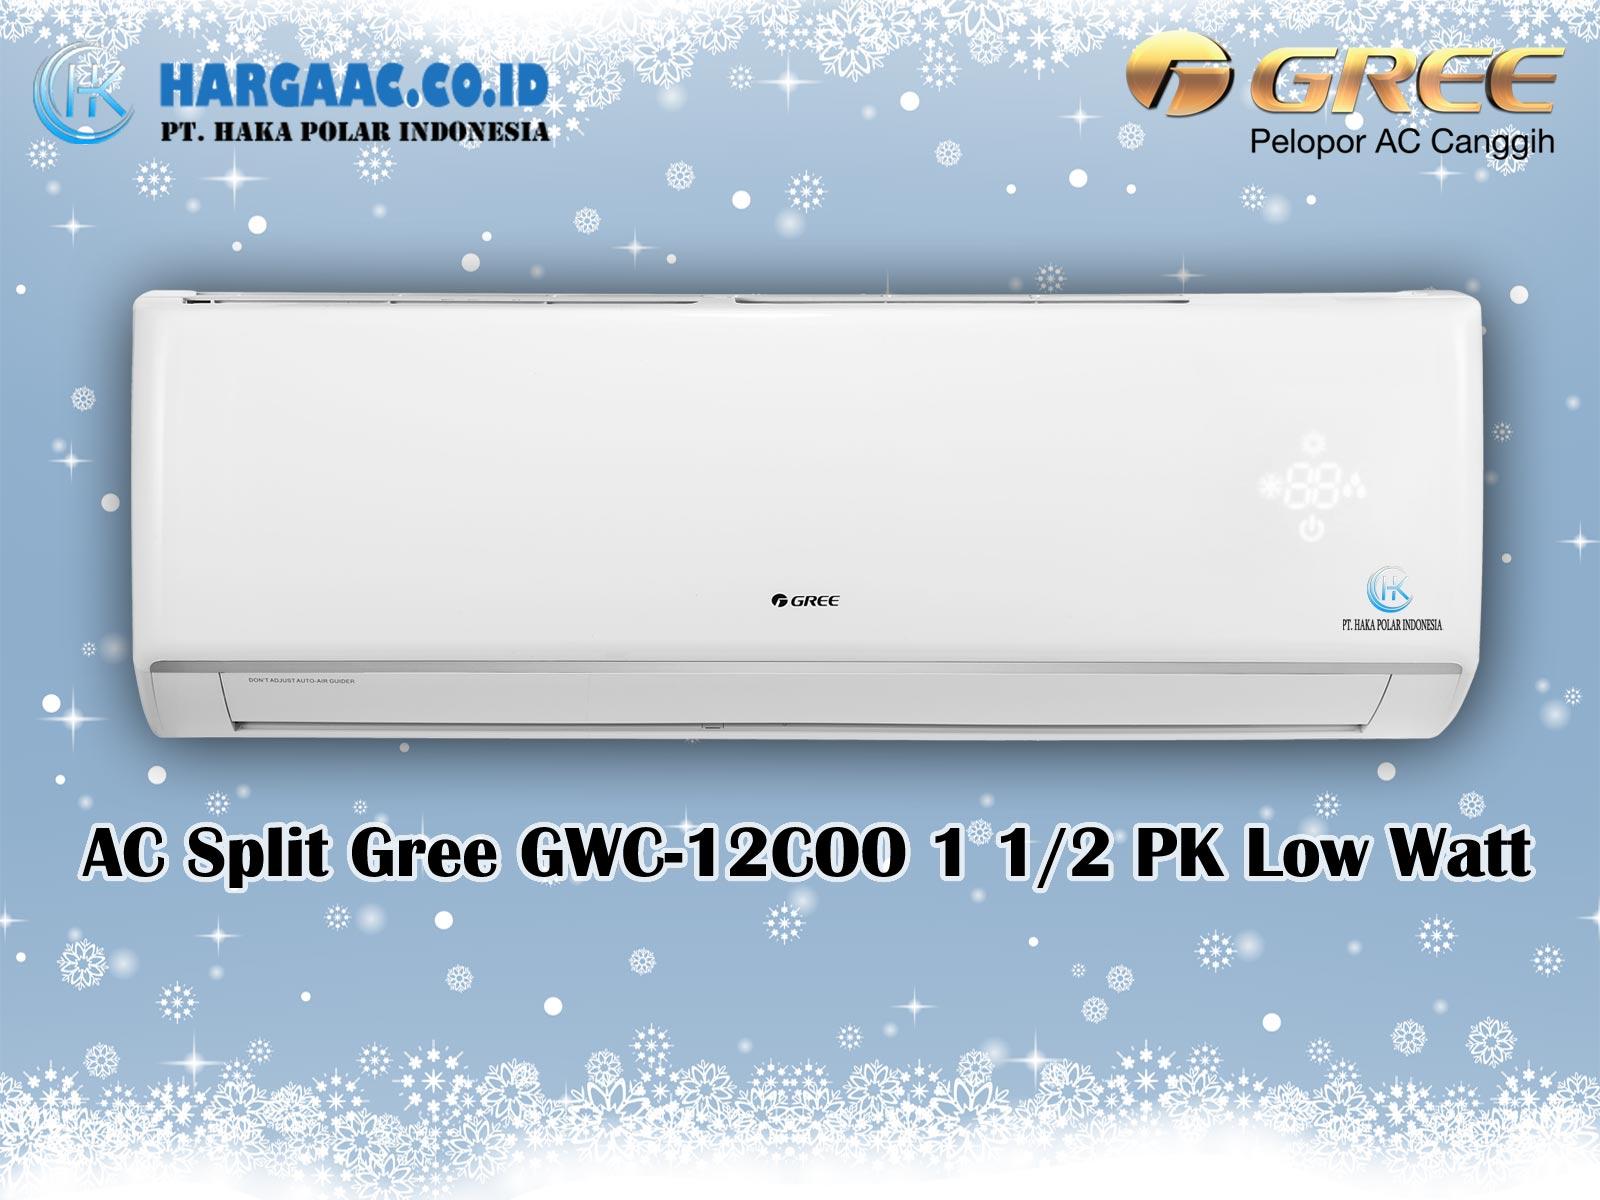 Harga Jual Ac Split Gree Gwc 12coo 1 1 2 Pk Low Watt Voltage